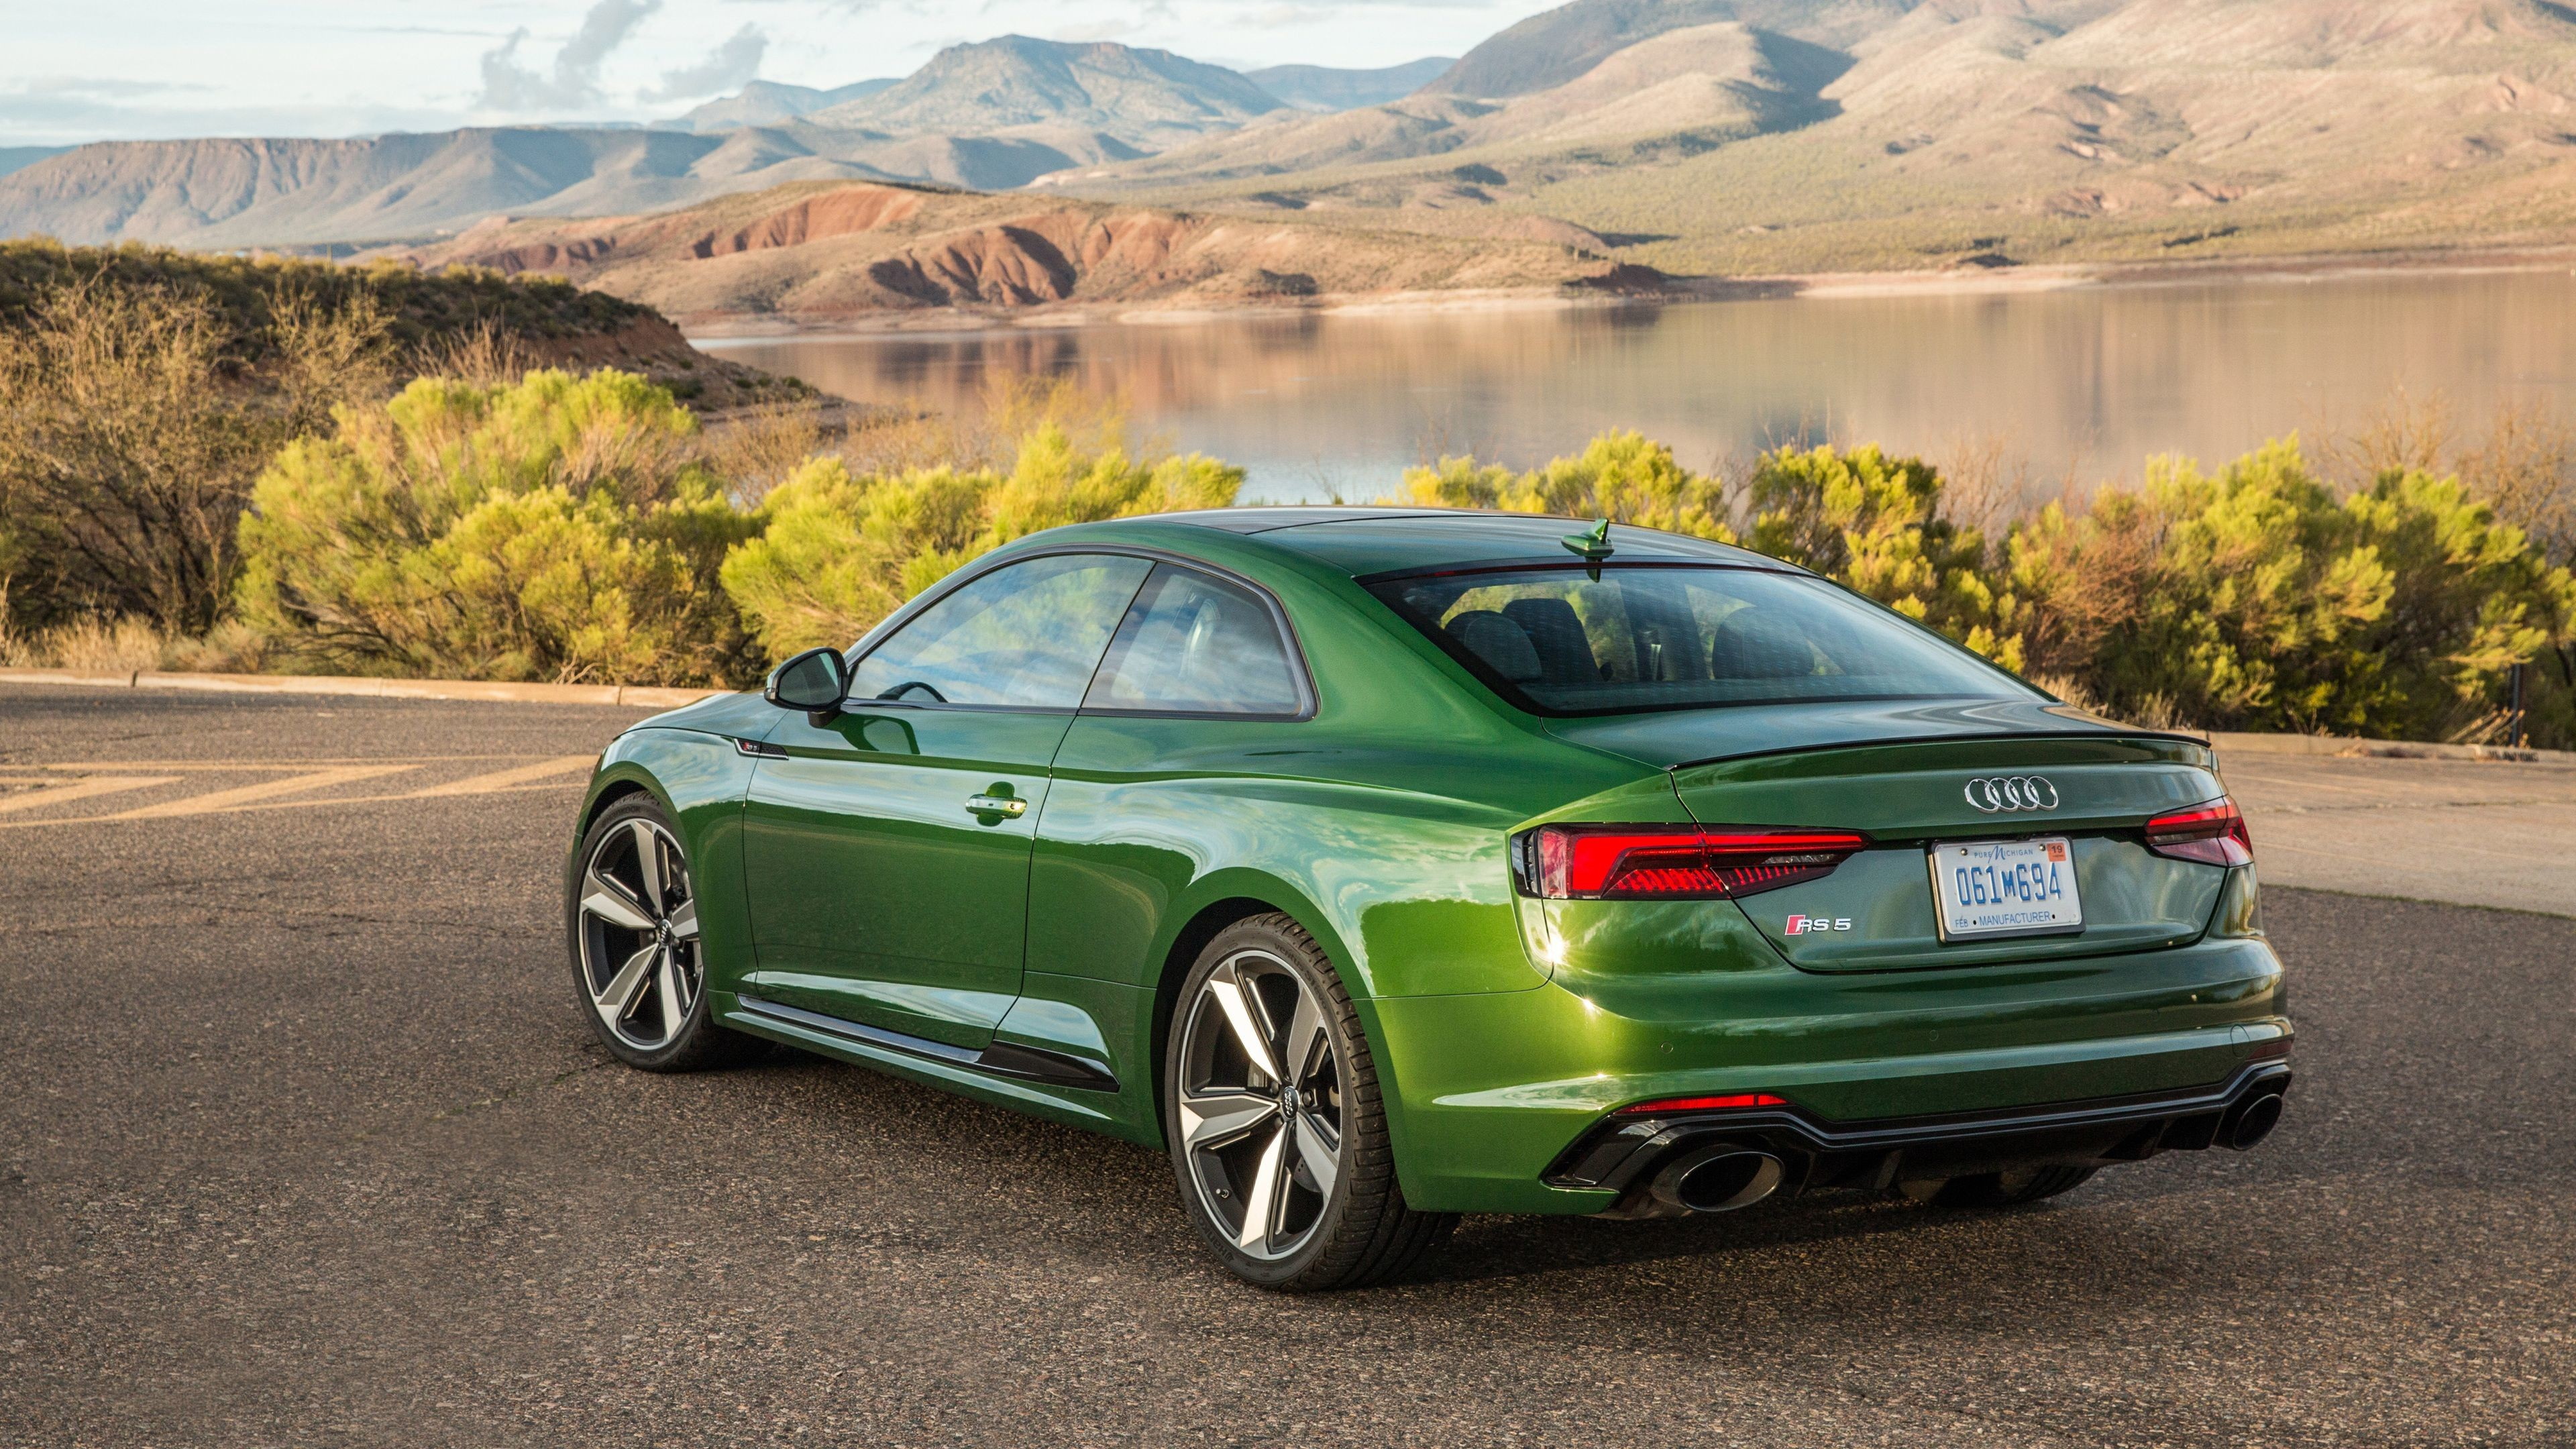 3840x2160 Audi Rs5 Coupe 4k 2018 Hd Wallpapers Cars Audi Rs5 Wallpaper Iphone 3840x2160 Wallpaper Teahub Io